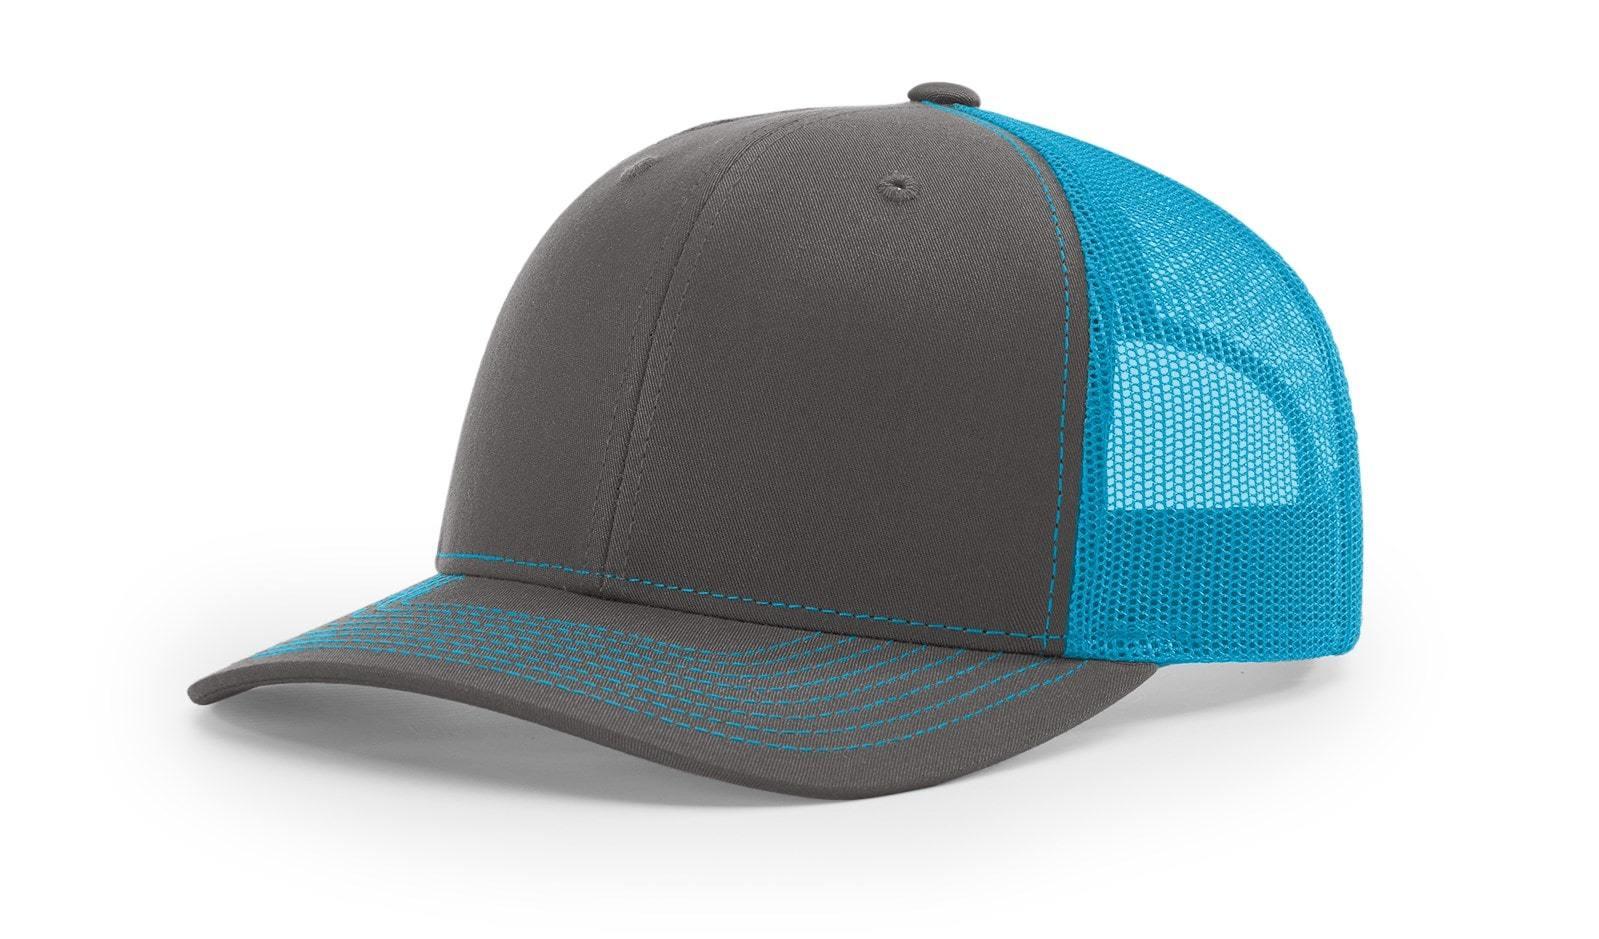 0d30ae021e644 Trucker Mesh Caps. Loading... 6089M Yupoong Blank Flexfit Hat Snapback Pro- Style ...